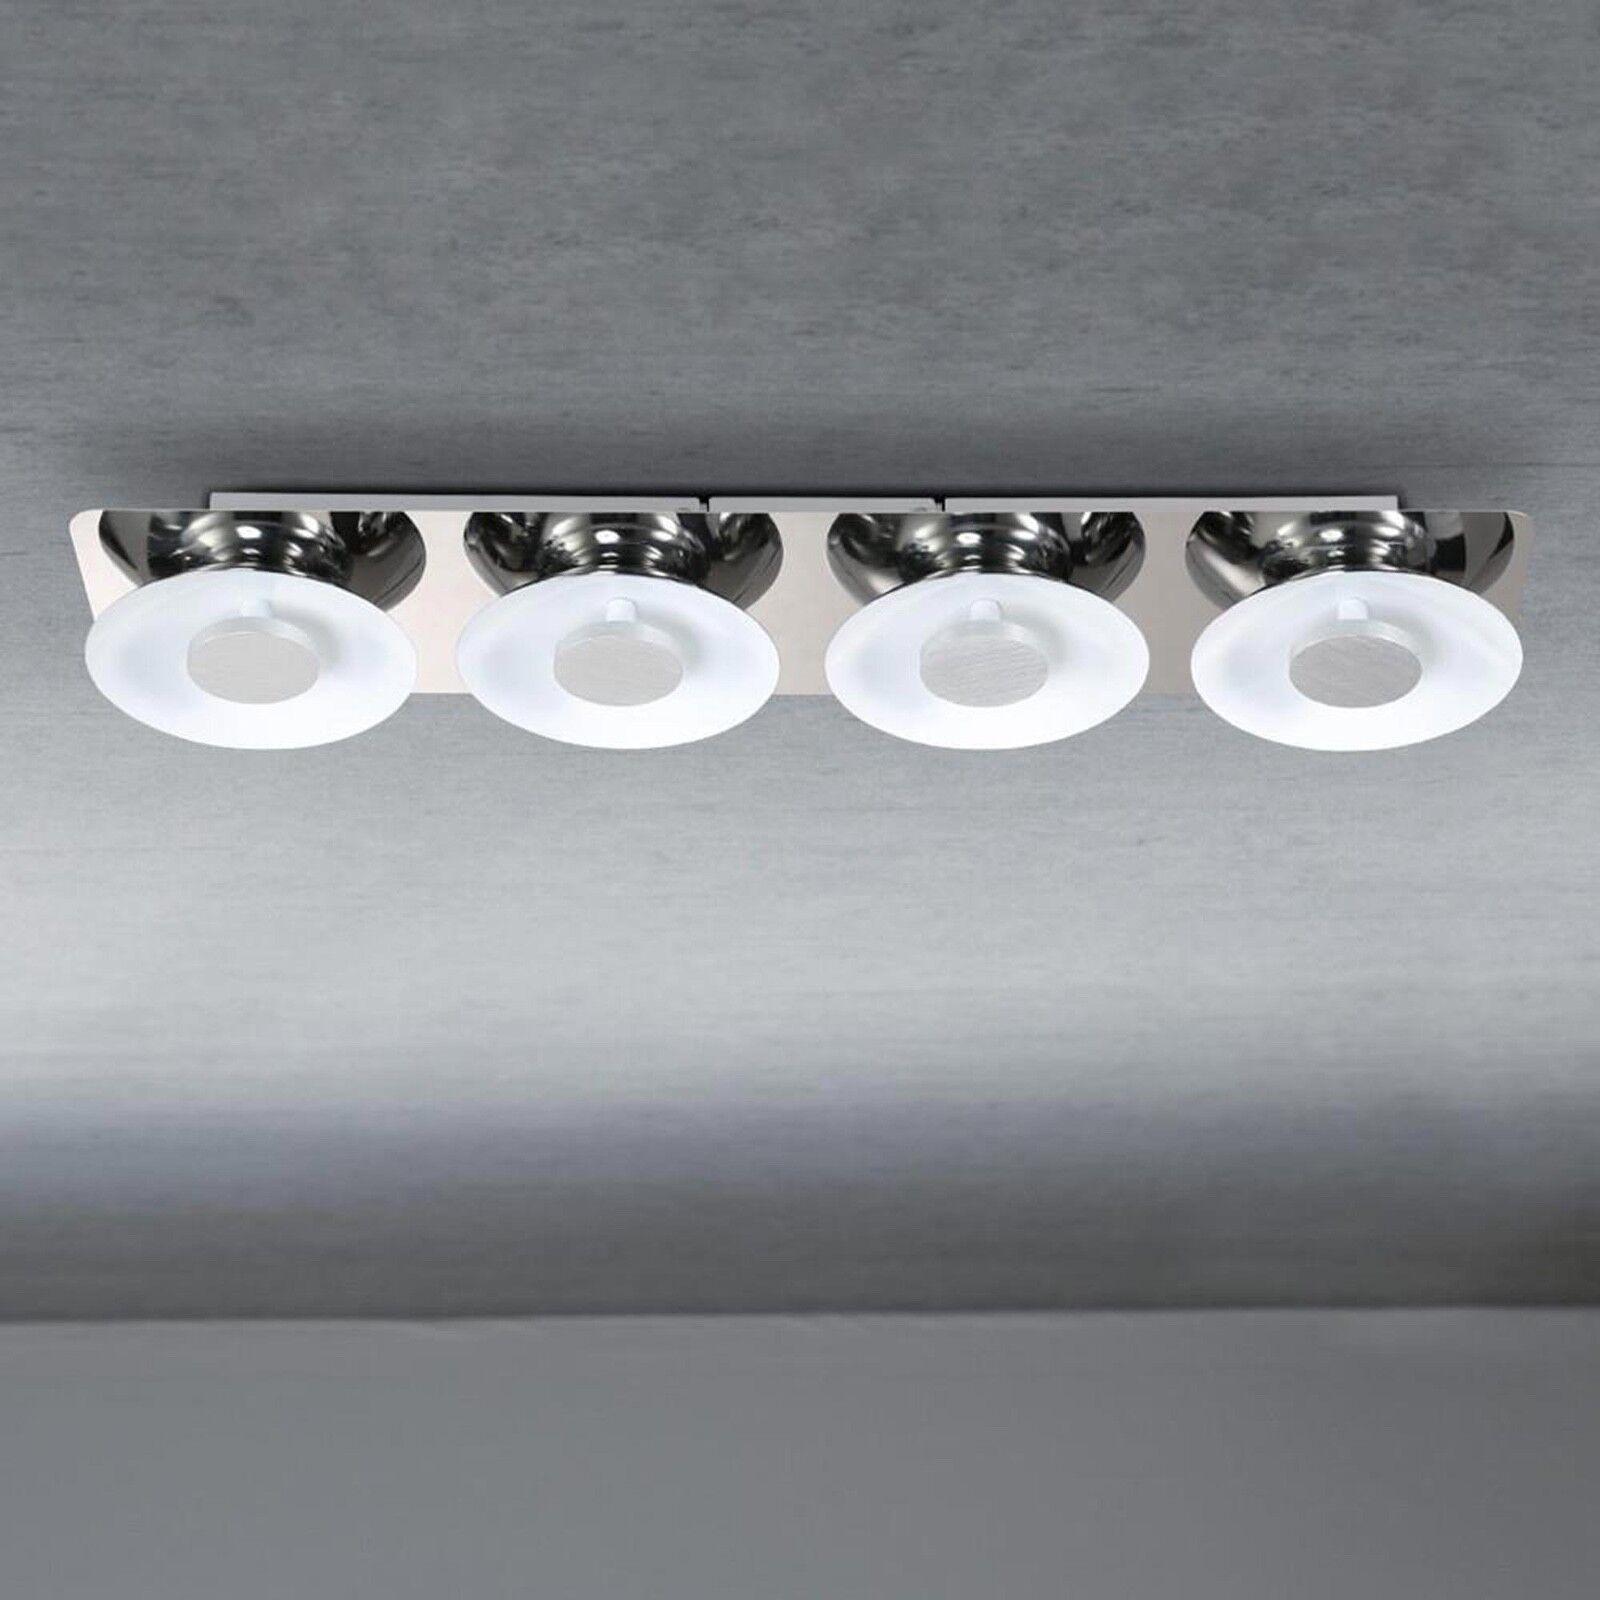 Wofi LED-Deckenleuchte Space 4-flg Chrom Dimmbar 24 Watt 2200 Lumen Lampe Licht